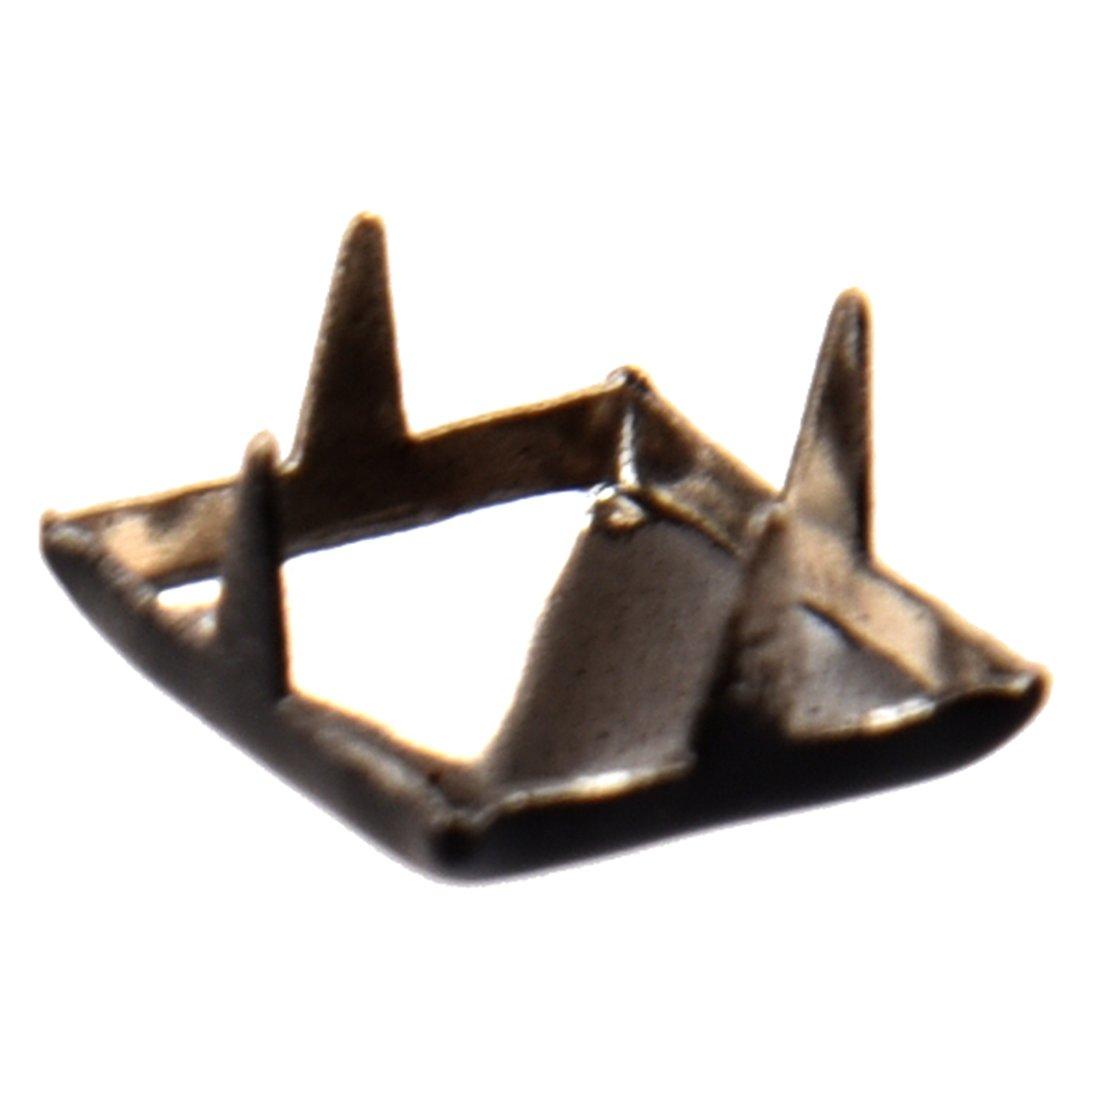 100pcs Pyramid Studs Spots Punk Spikes for DIY Craft Leathercraft Black R SODIAL